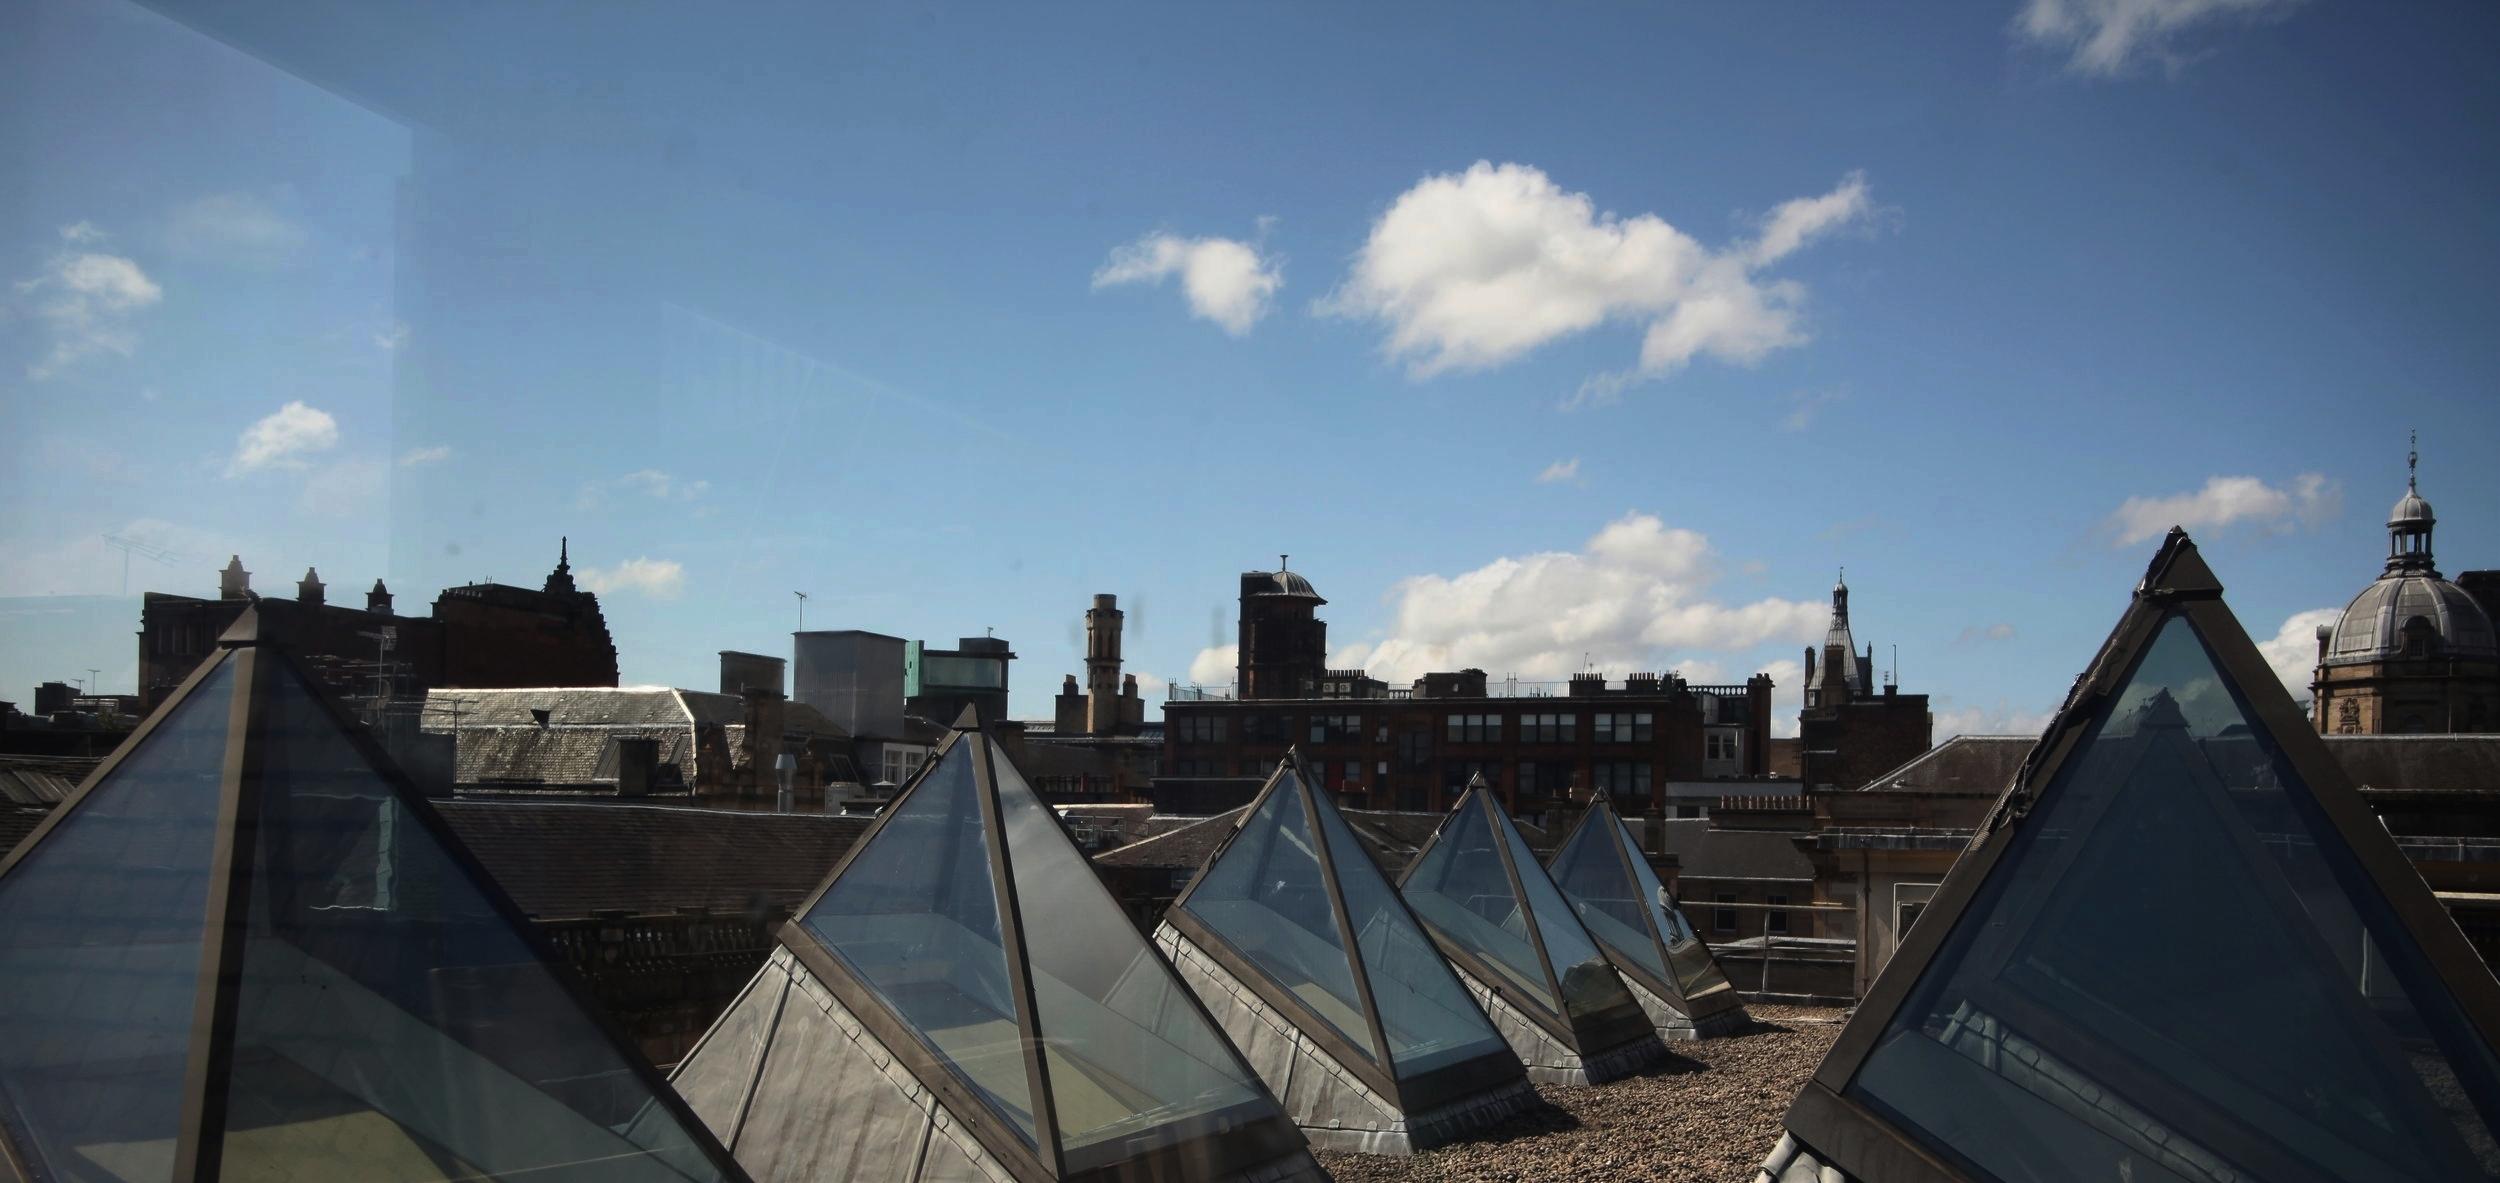 Gallery of Modern Art   Royal Exchange Square G1 3AH, UK